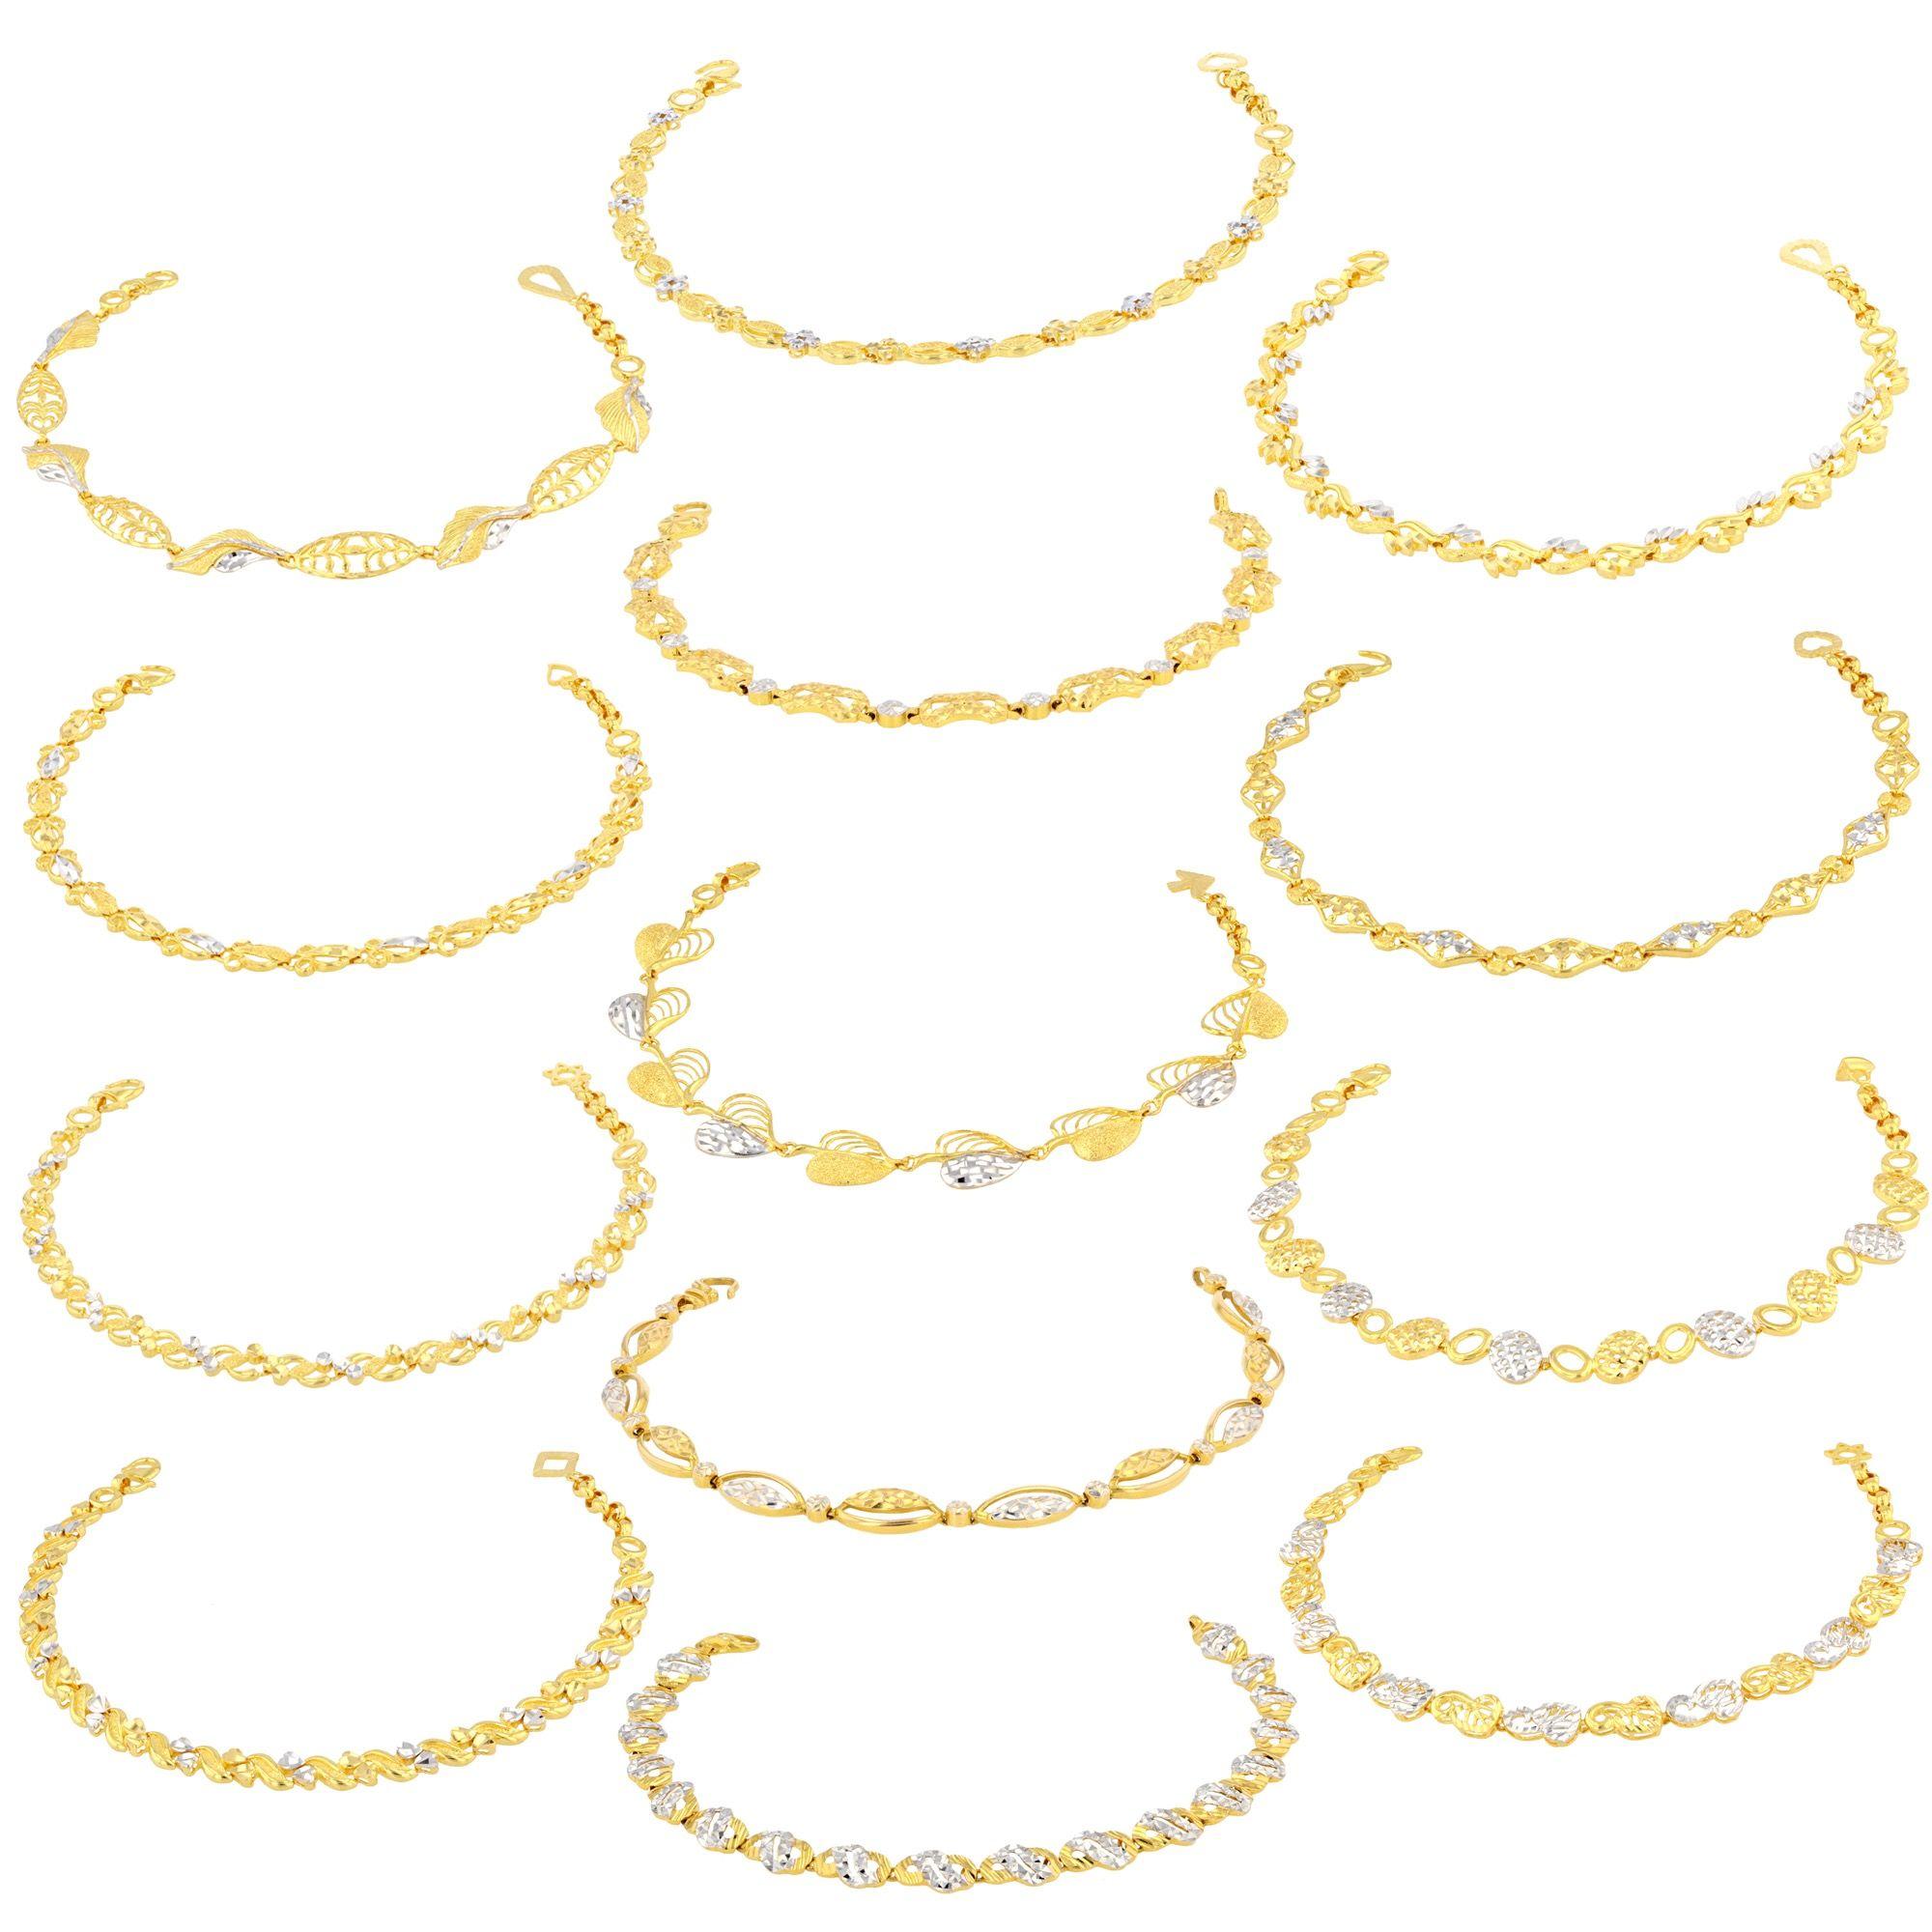 68ceb4f87fefa Ladies Bracelets made of 22ct Yellow Gold & Rhodium (bundle of 13 ...